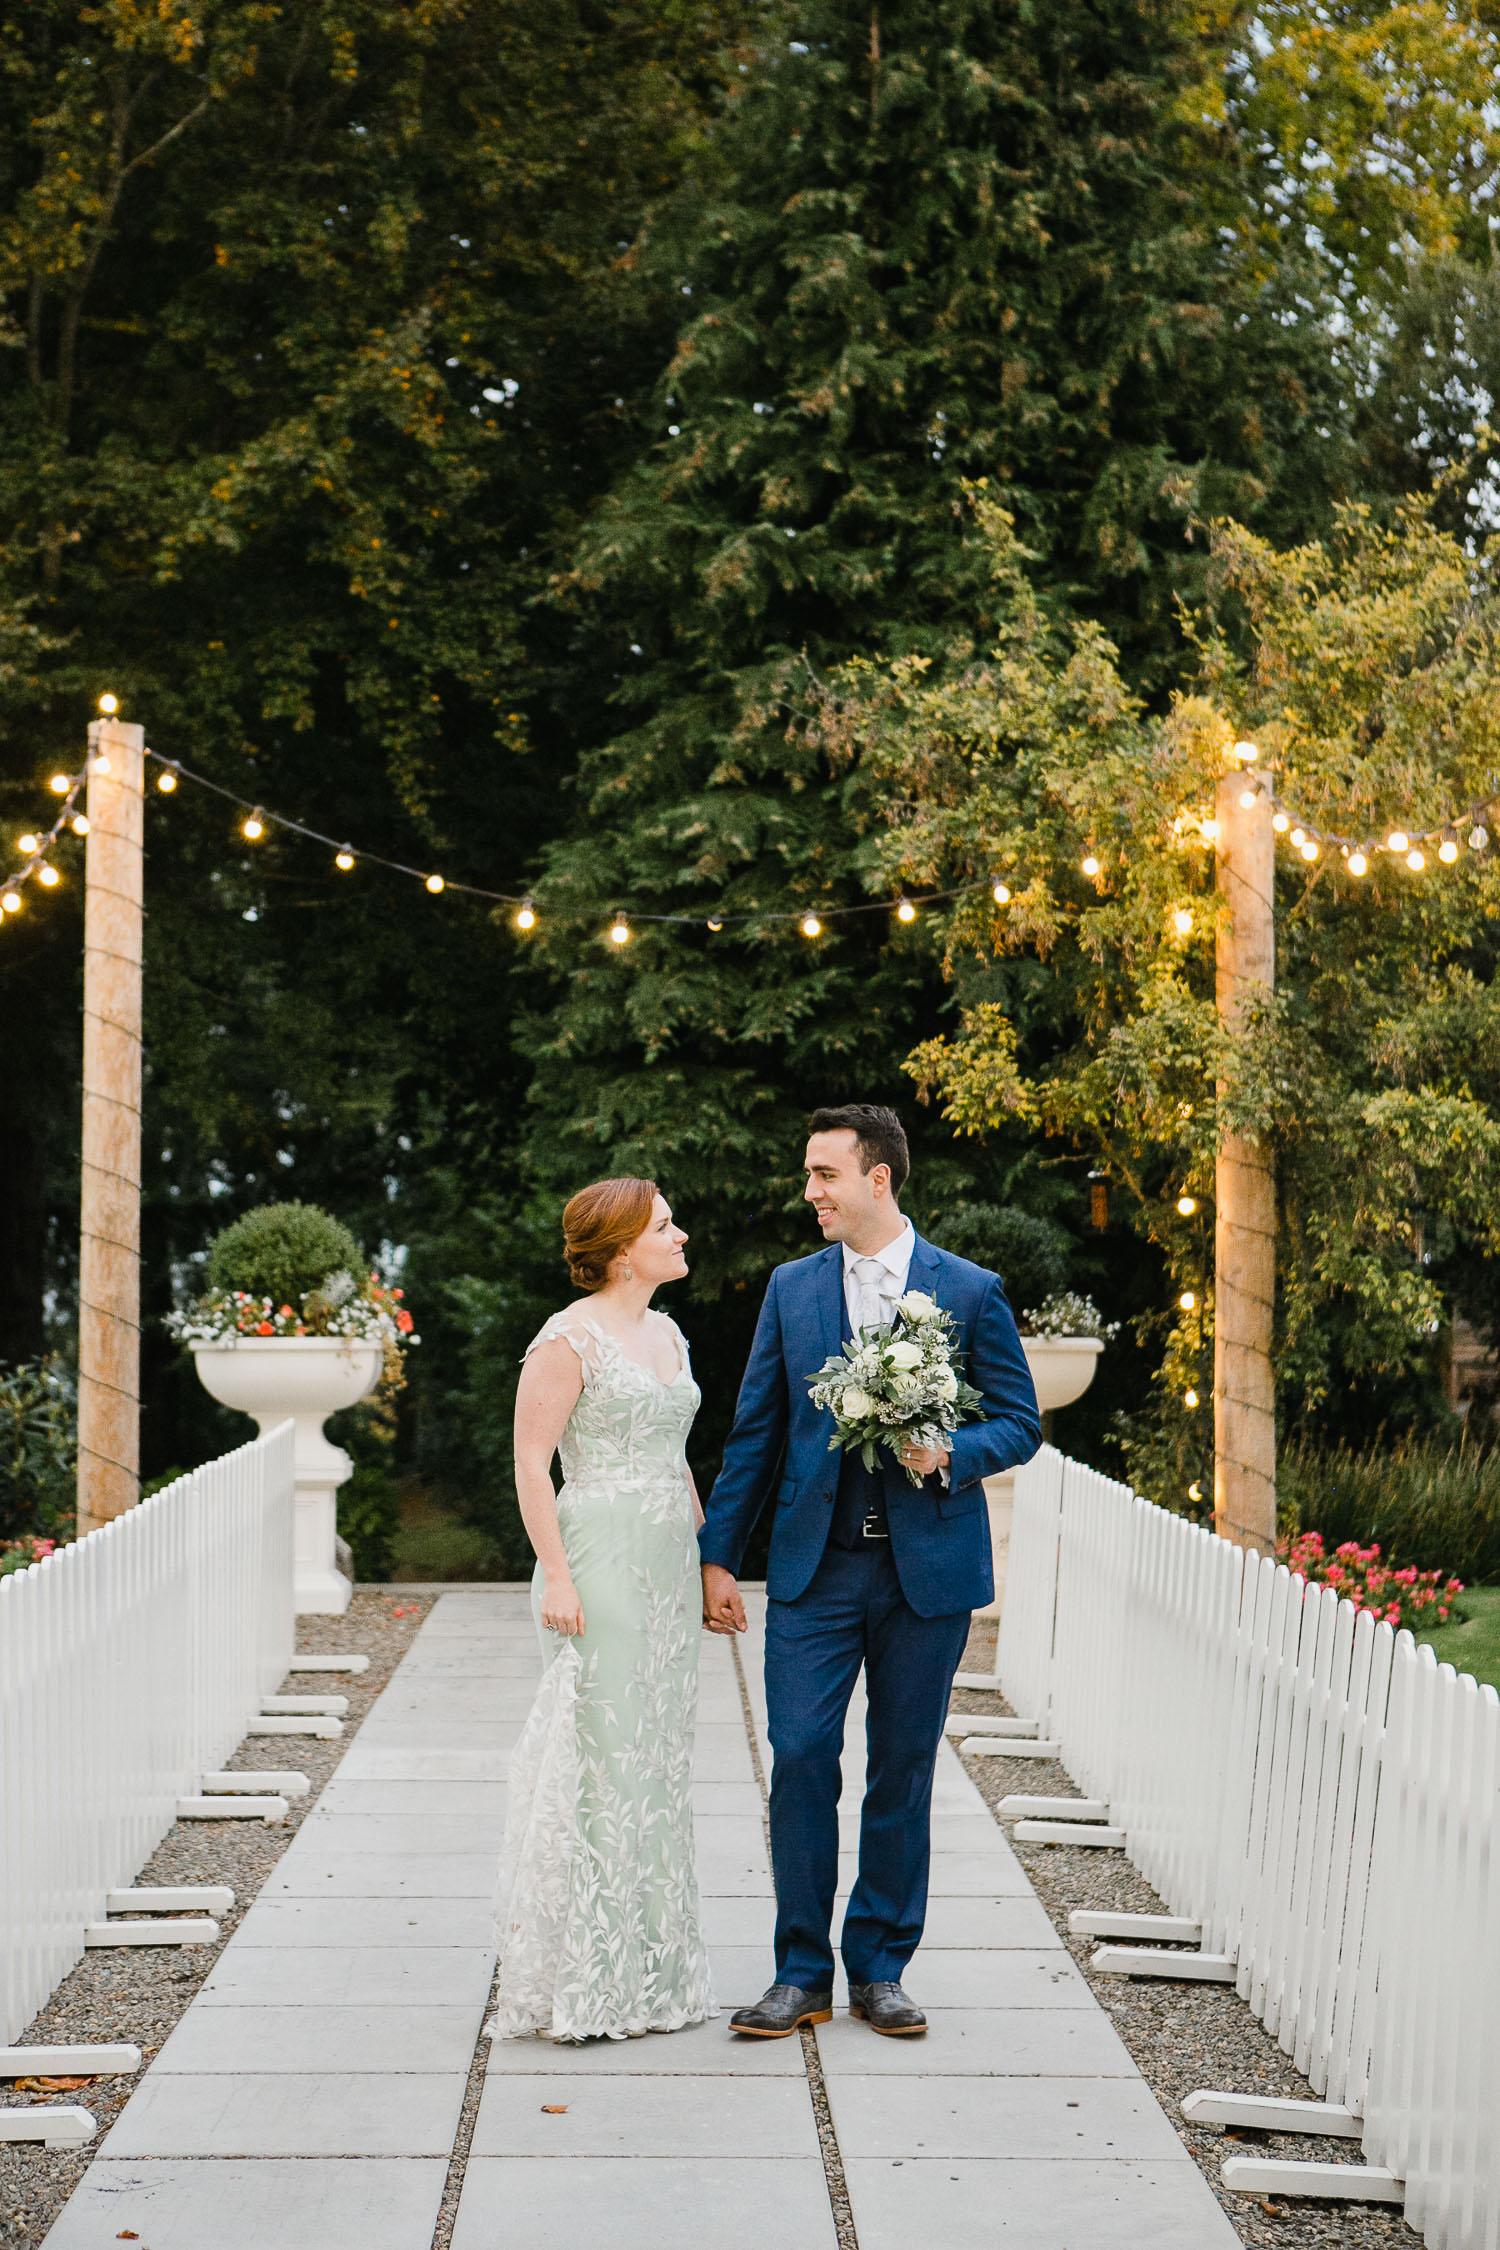 Wicklow Wedding Photography By Dasha Caffrey